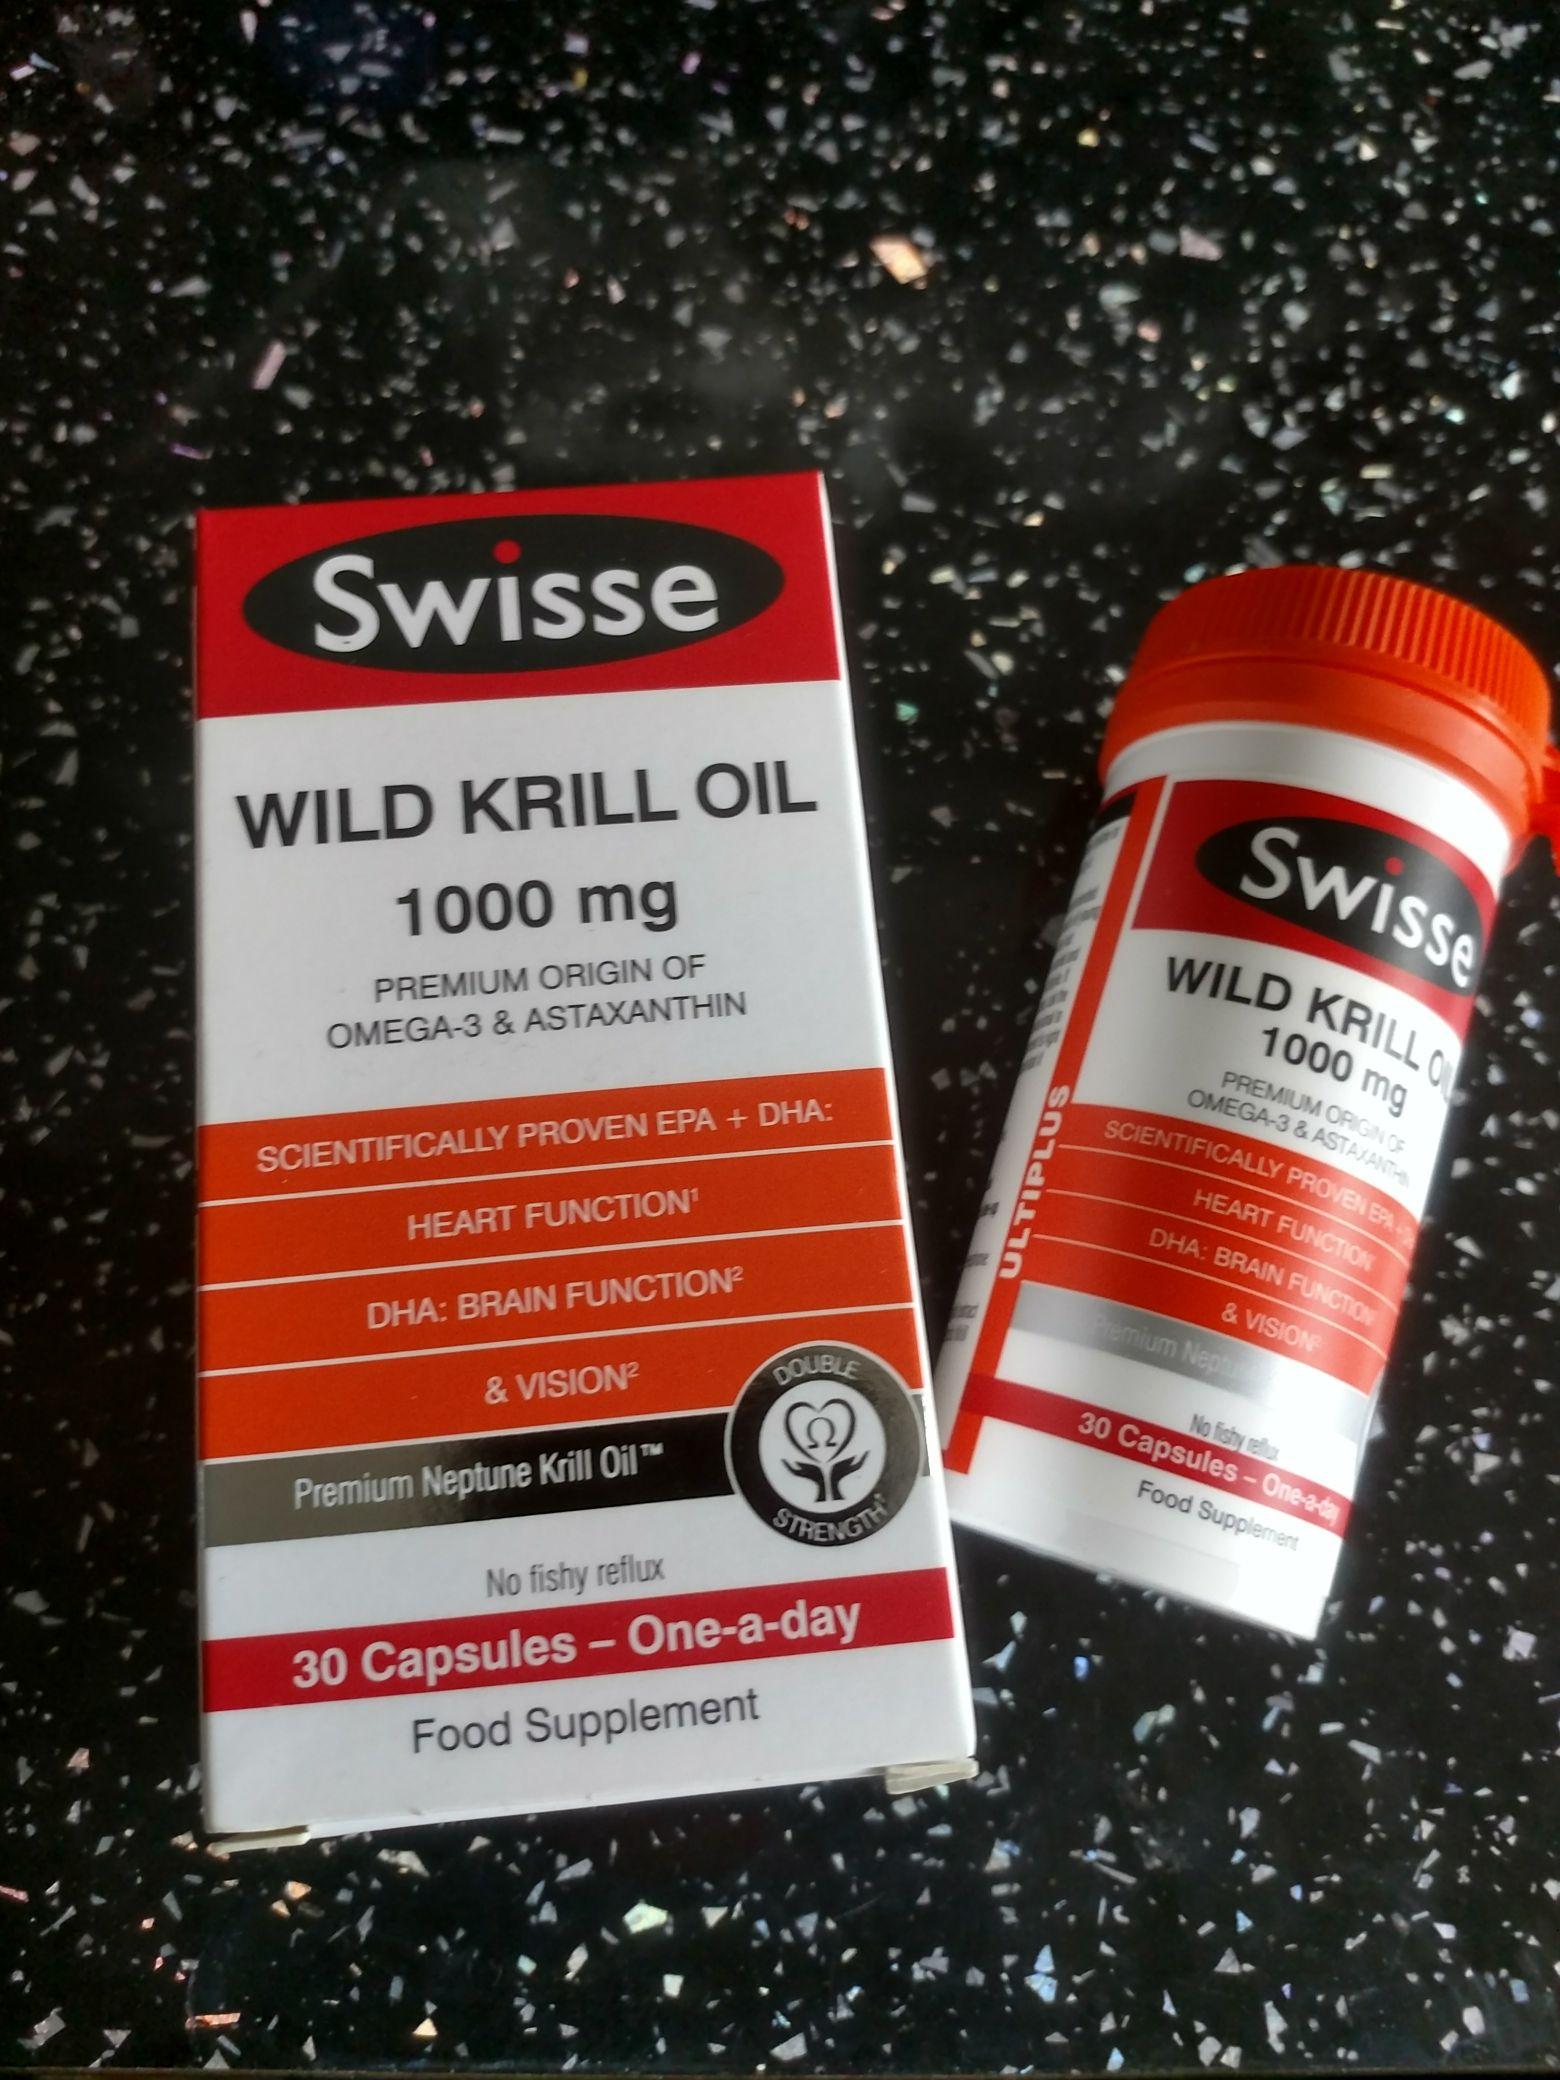 Swisse krill oil 1000mg 30 capsules £4.49 @ Home Bargains